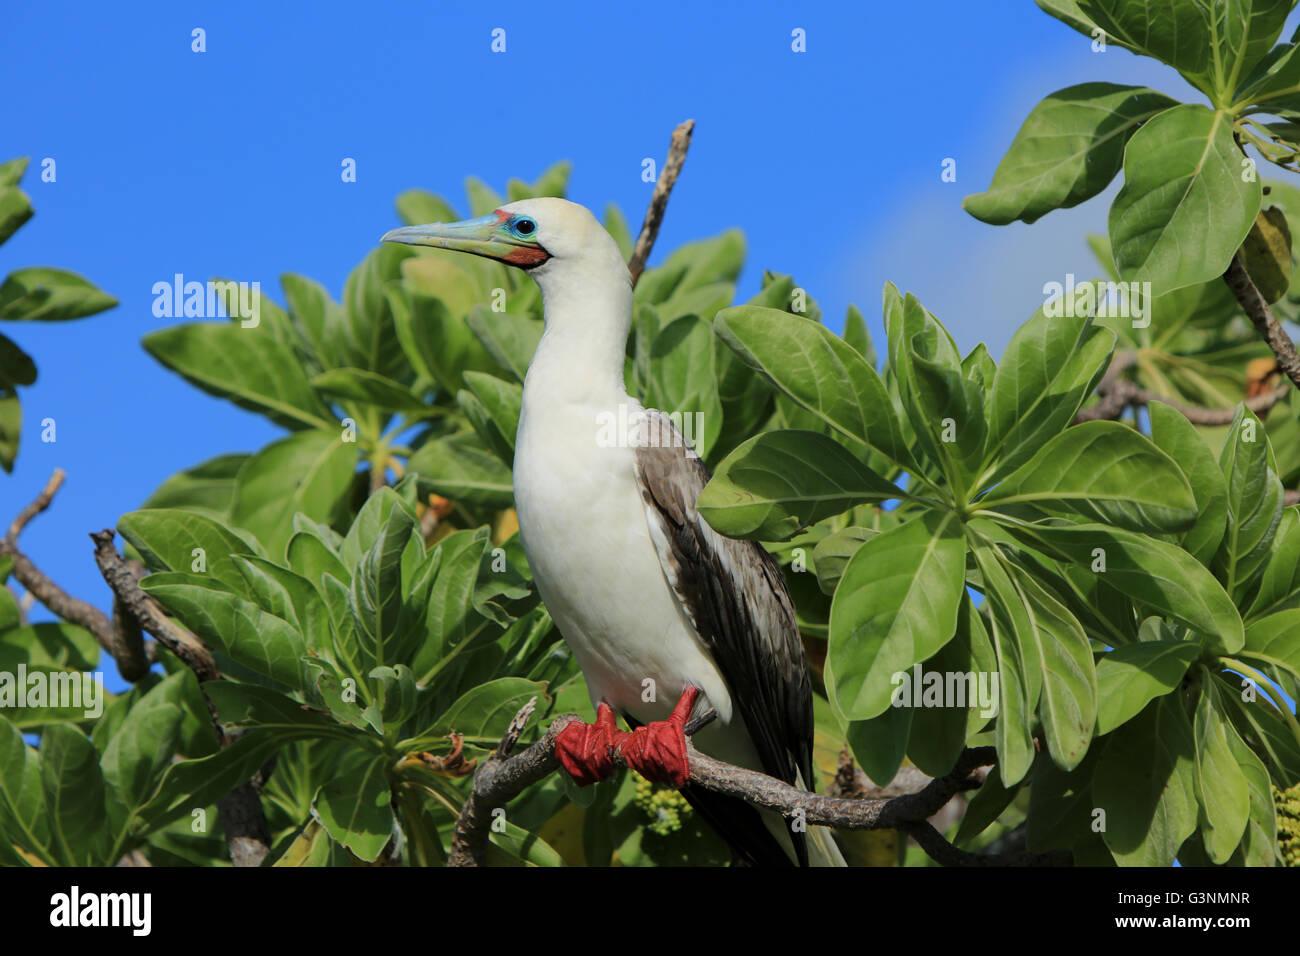 Red-Footed Booby bird, Christmas Island, Kiribati - Stock Image